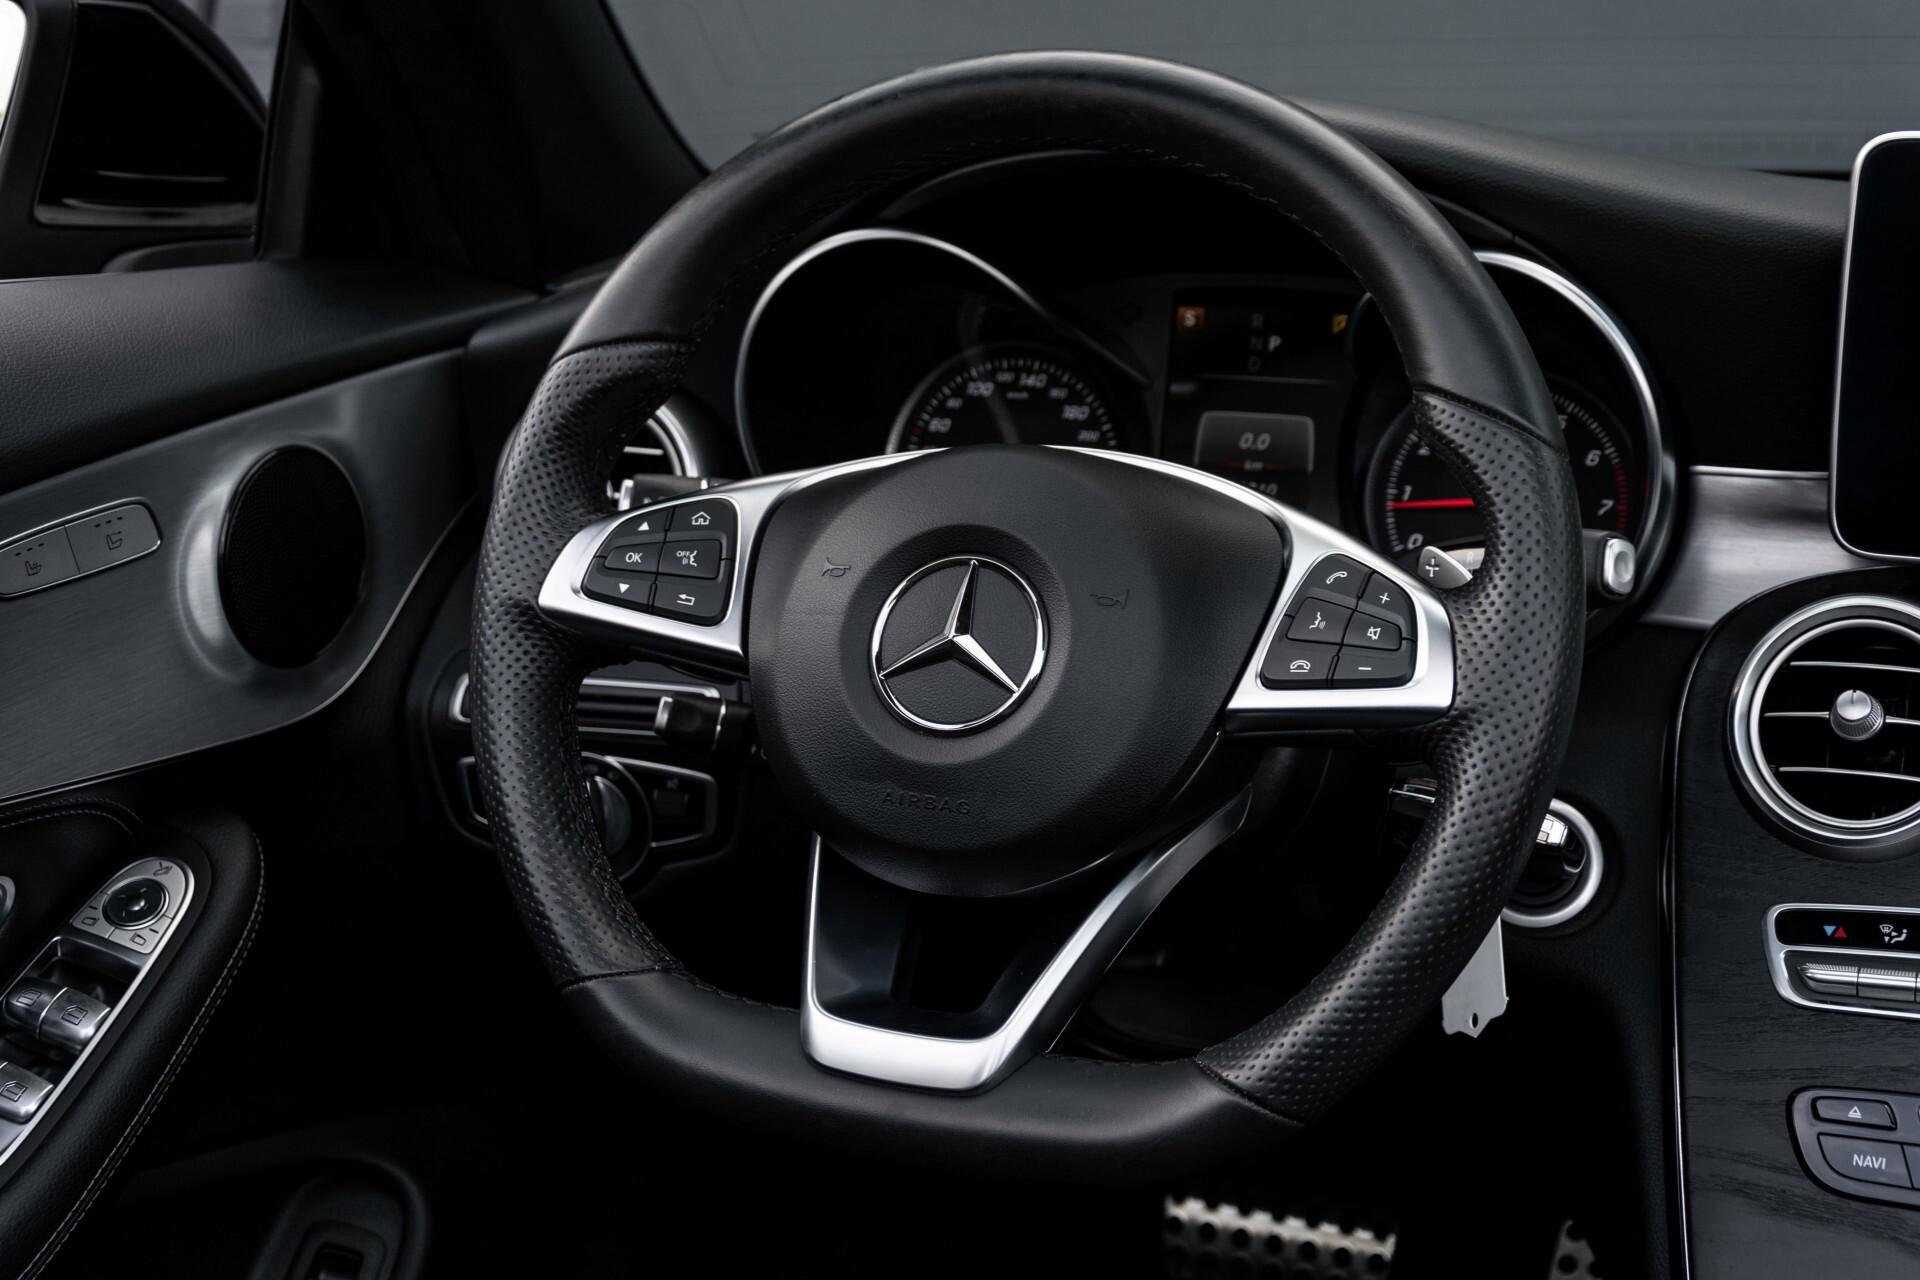 Mercedes-Benz C-Klasse Cabrio 250 AMG Airscarf/Aircap/Comand/ILS/Camera/Rode cabriokap Aut9 Foto 8